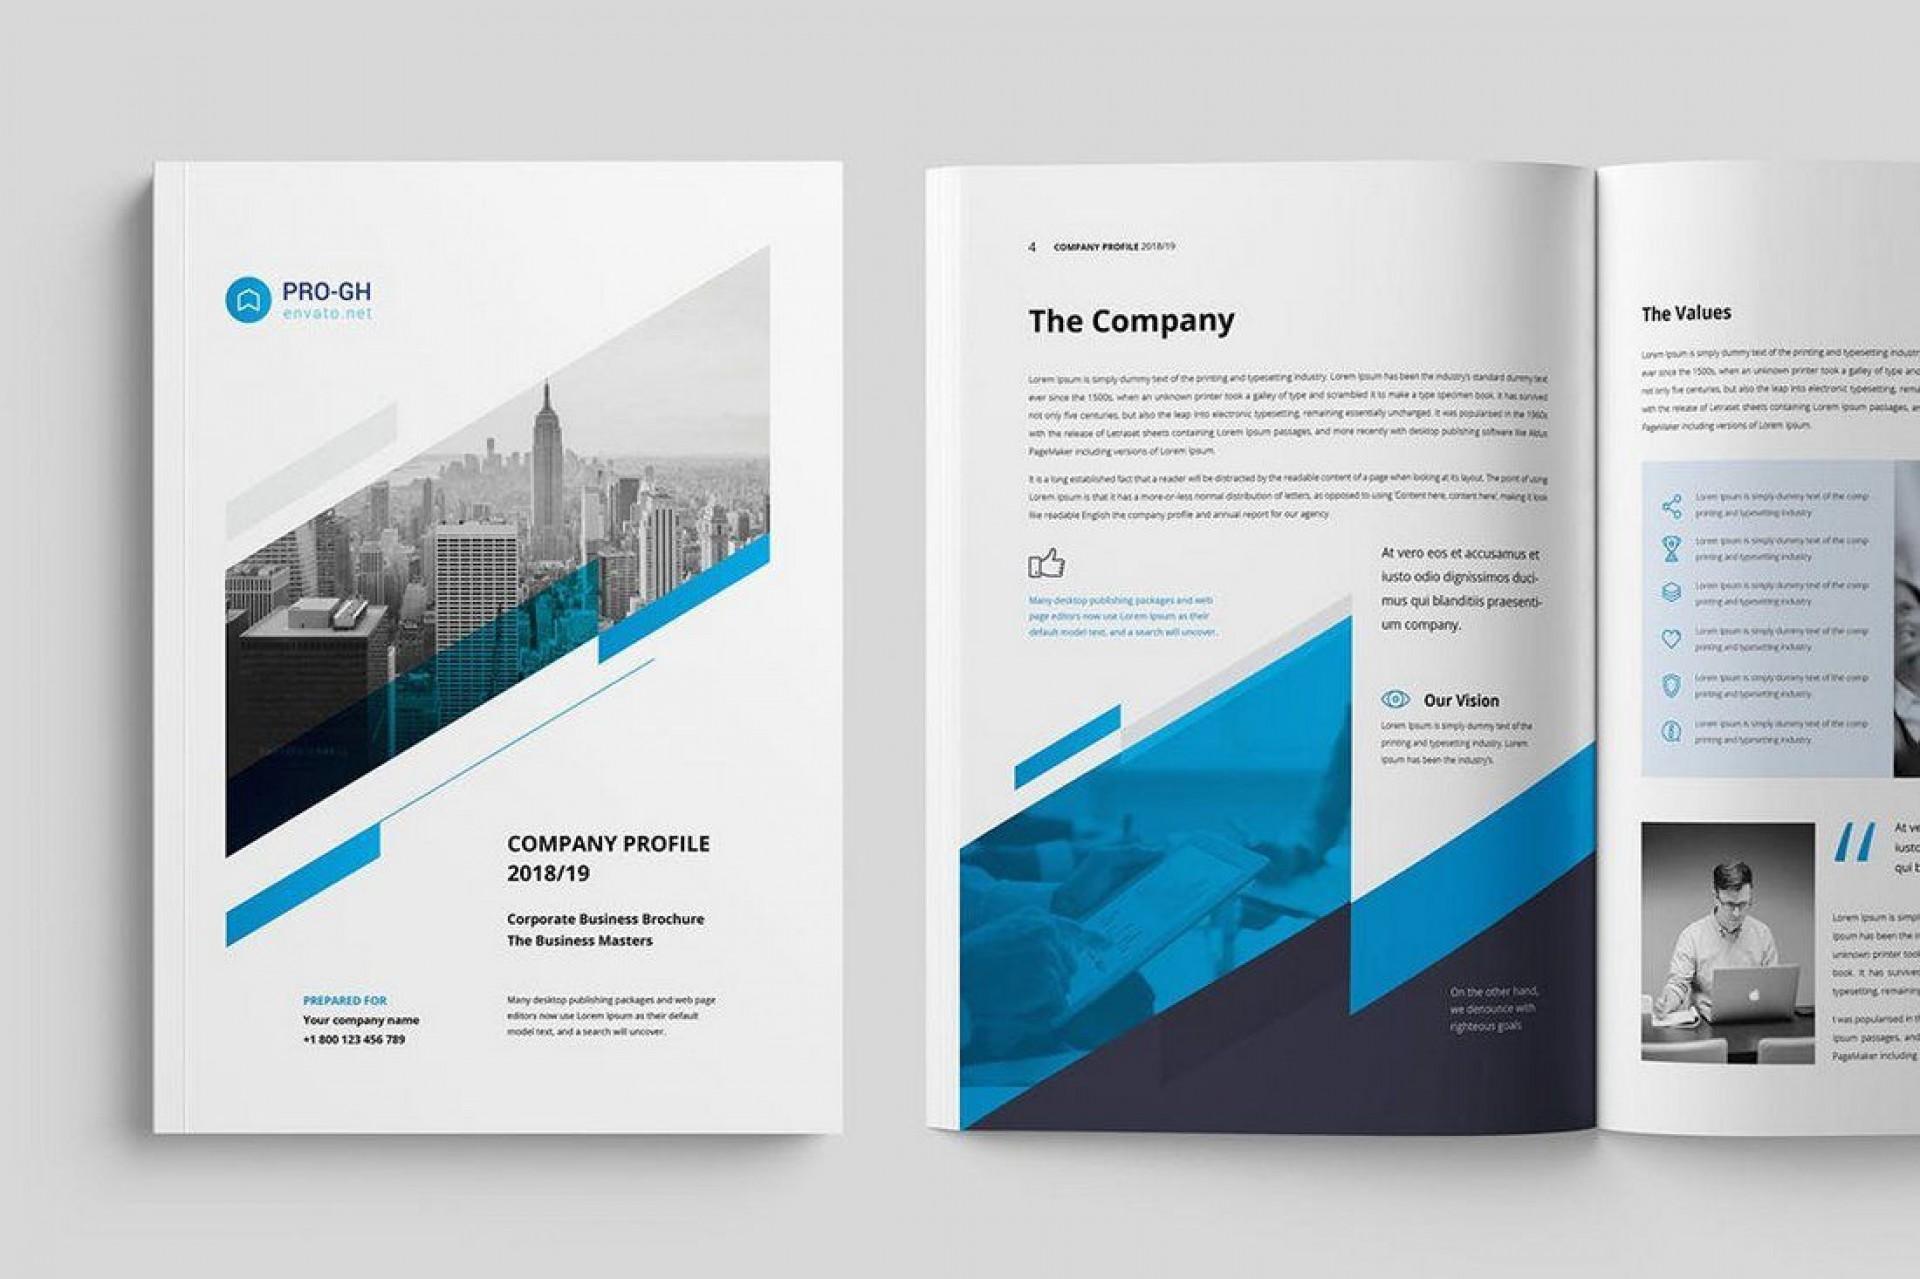 008 Best Corporate Brochure Design Template Psd Free Download Inspiration  Tri Fold Hotel1920